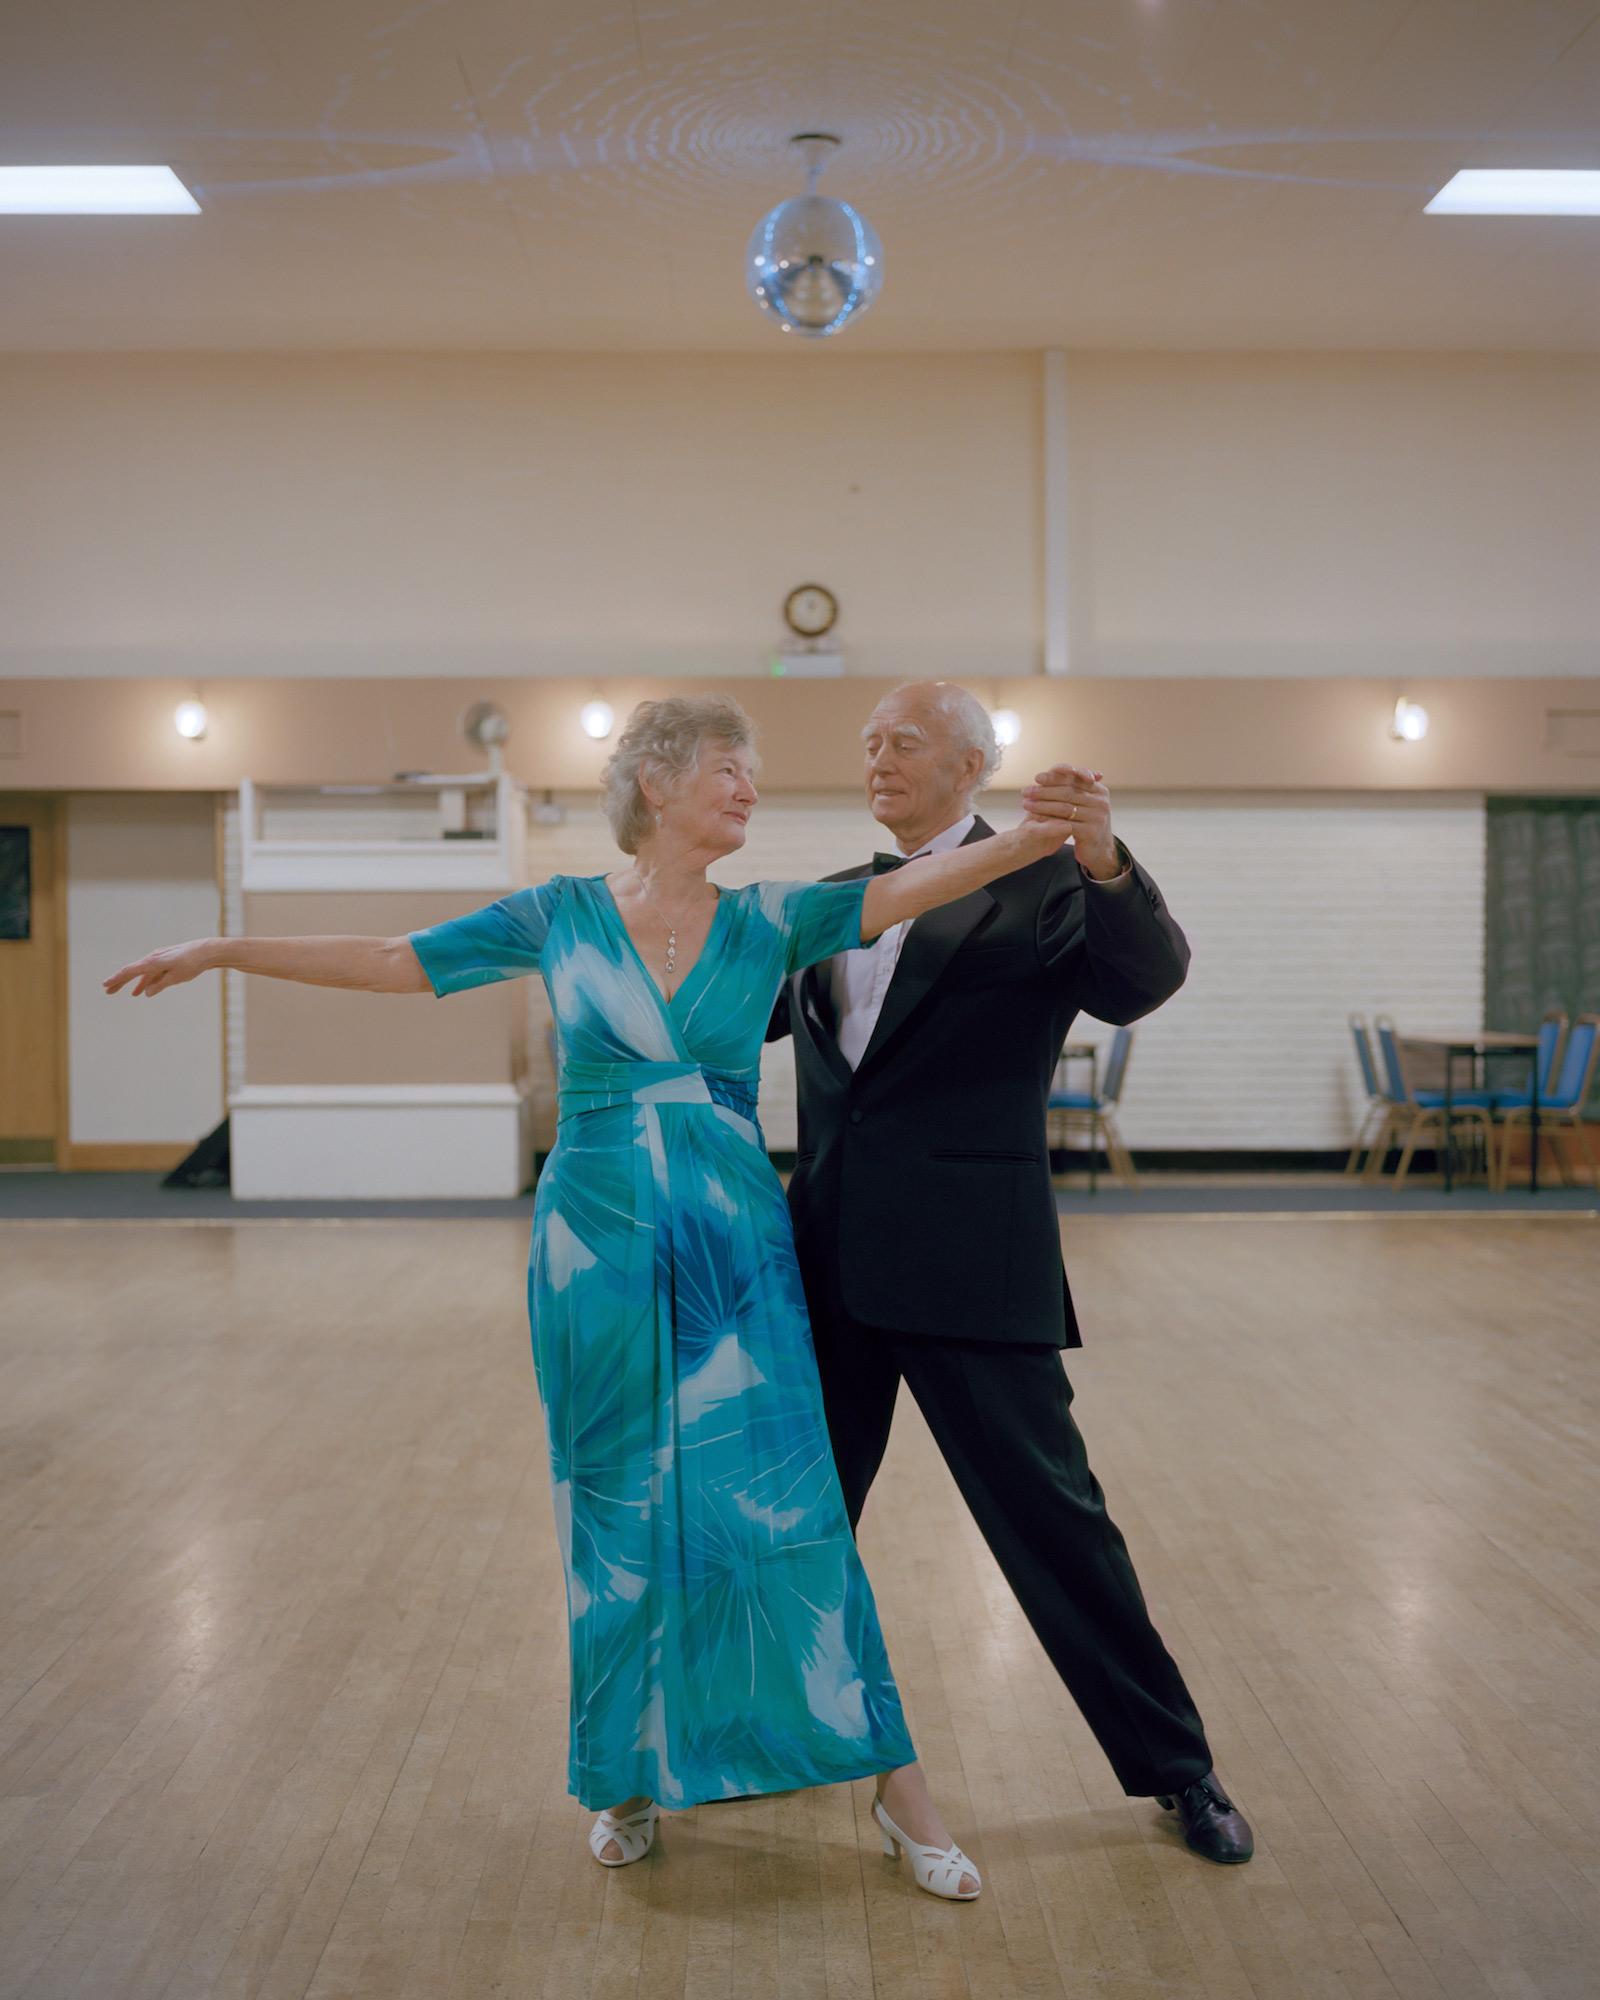 Bill, an ex-miner, with his partner Pauline attending their Ballroom Dancing class, Forest Town Miners' Welfare, Nottinghamshire.